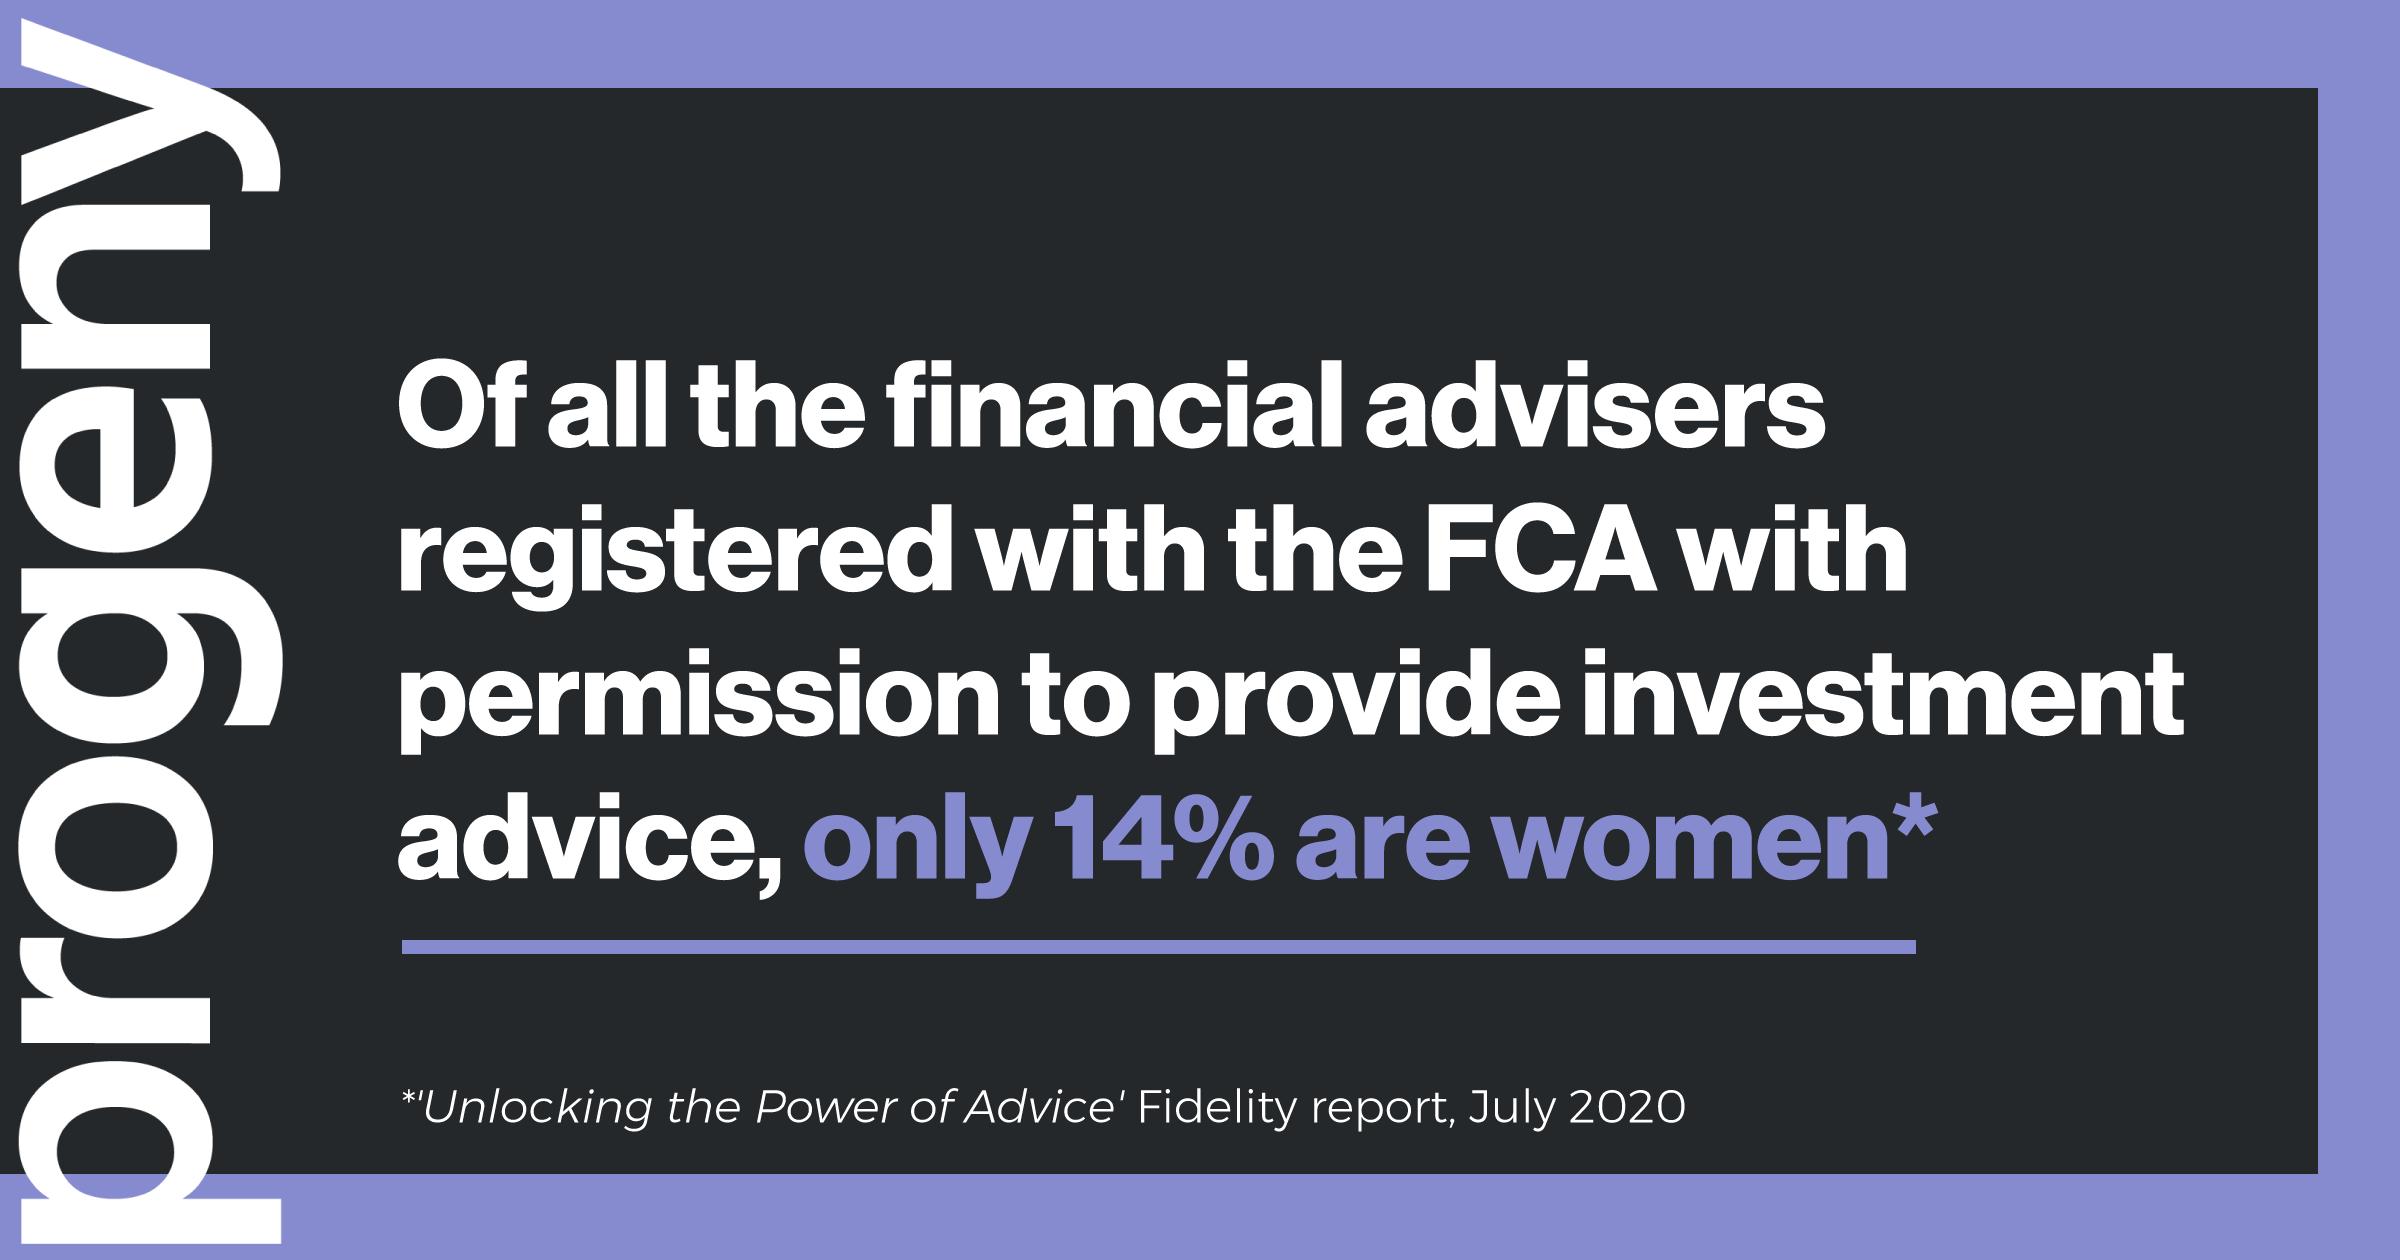 female advisers